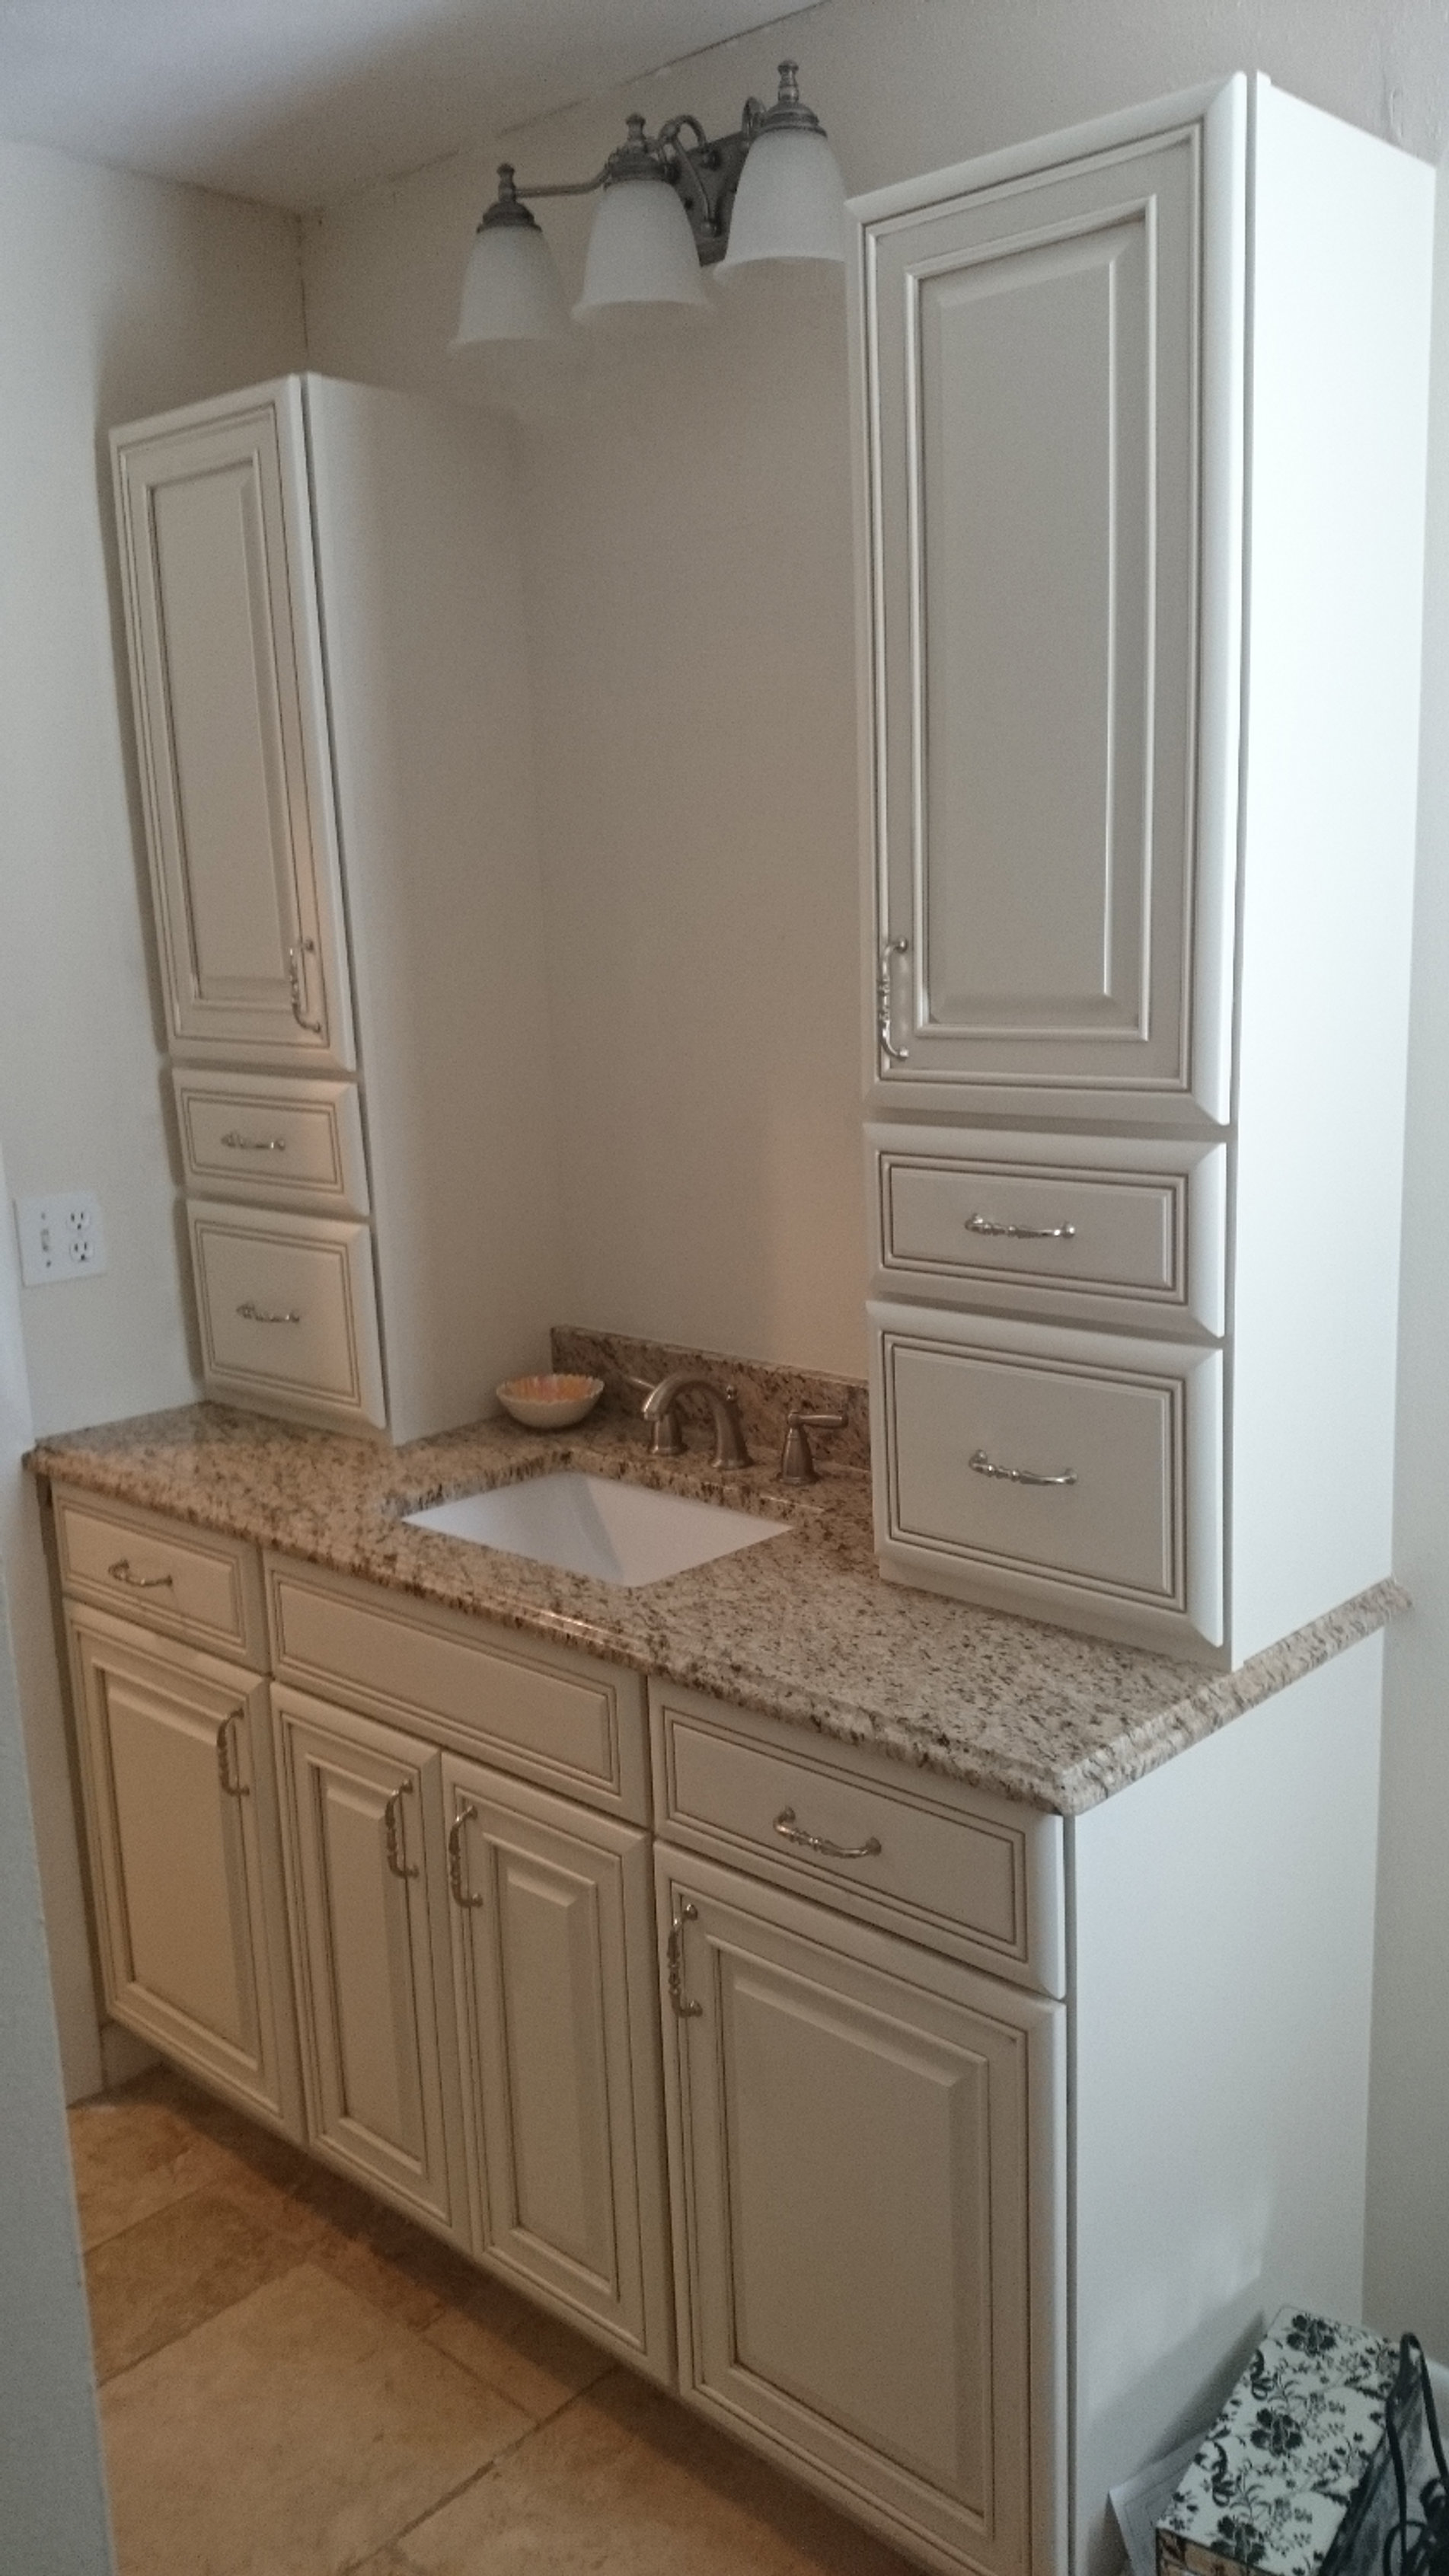 Pictures Of Granite Countertops Marble Vanities Natural